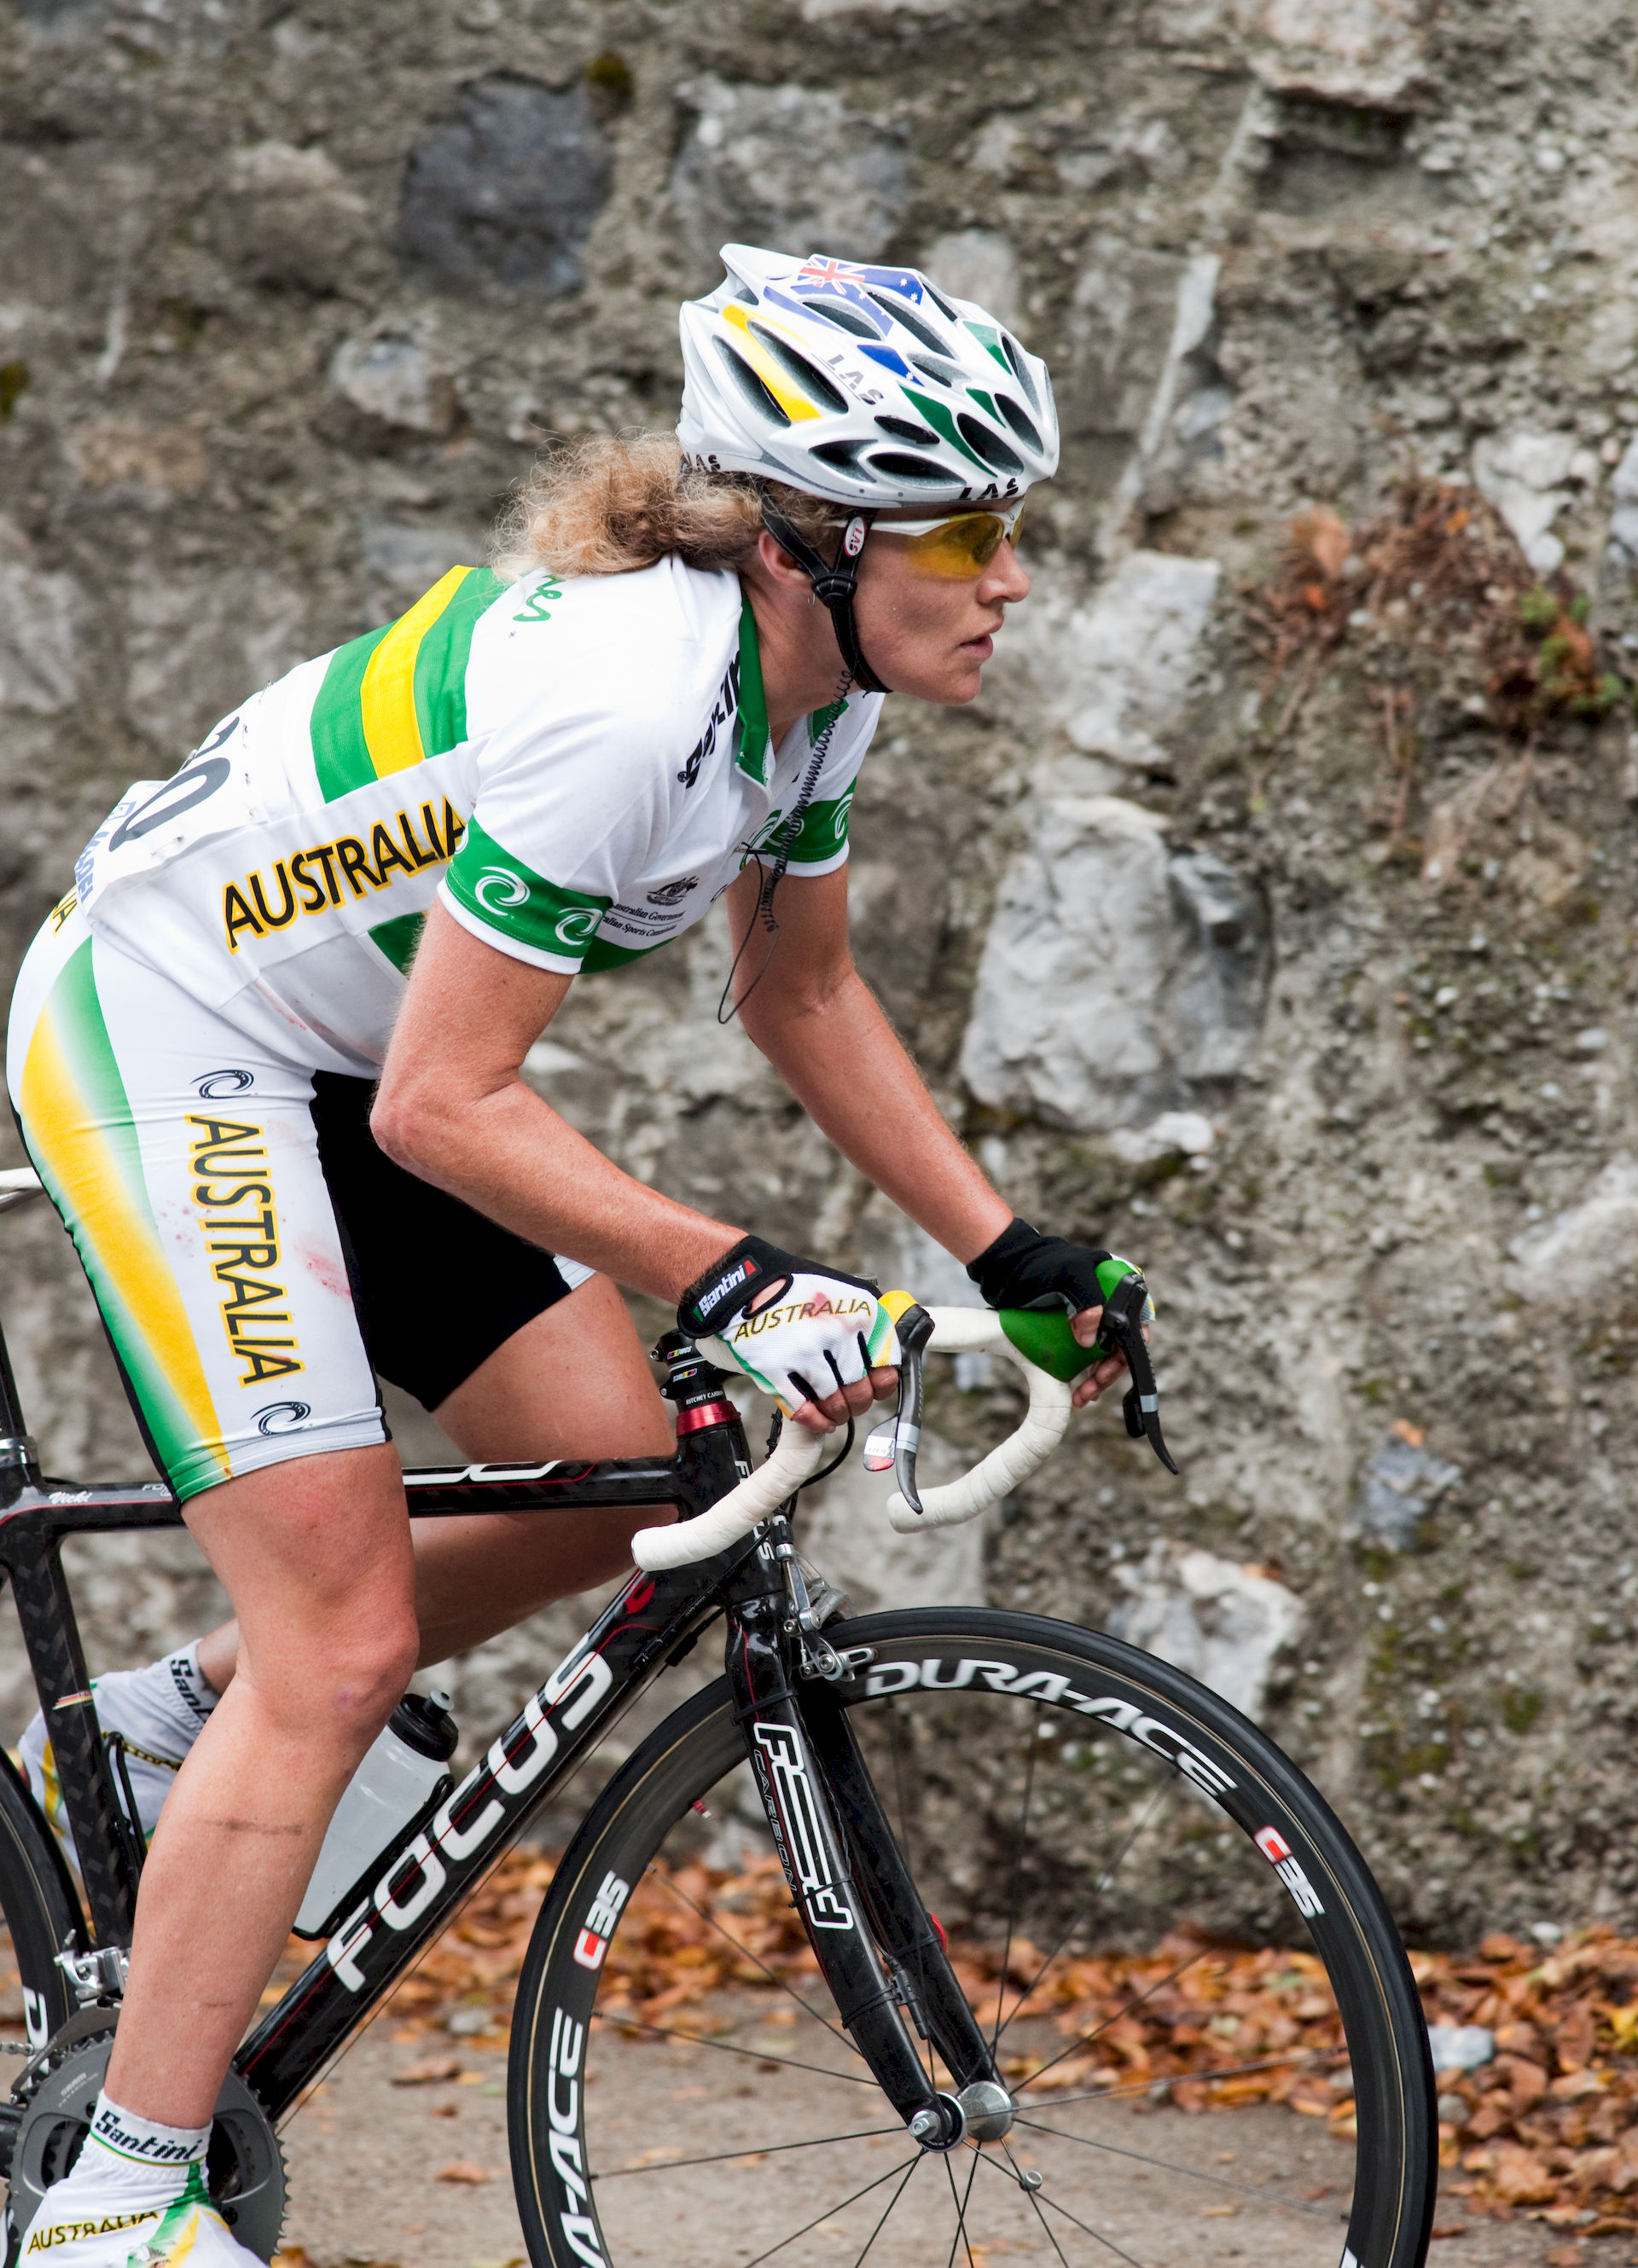 Photo of Vicki Whitelaw: Cyclist